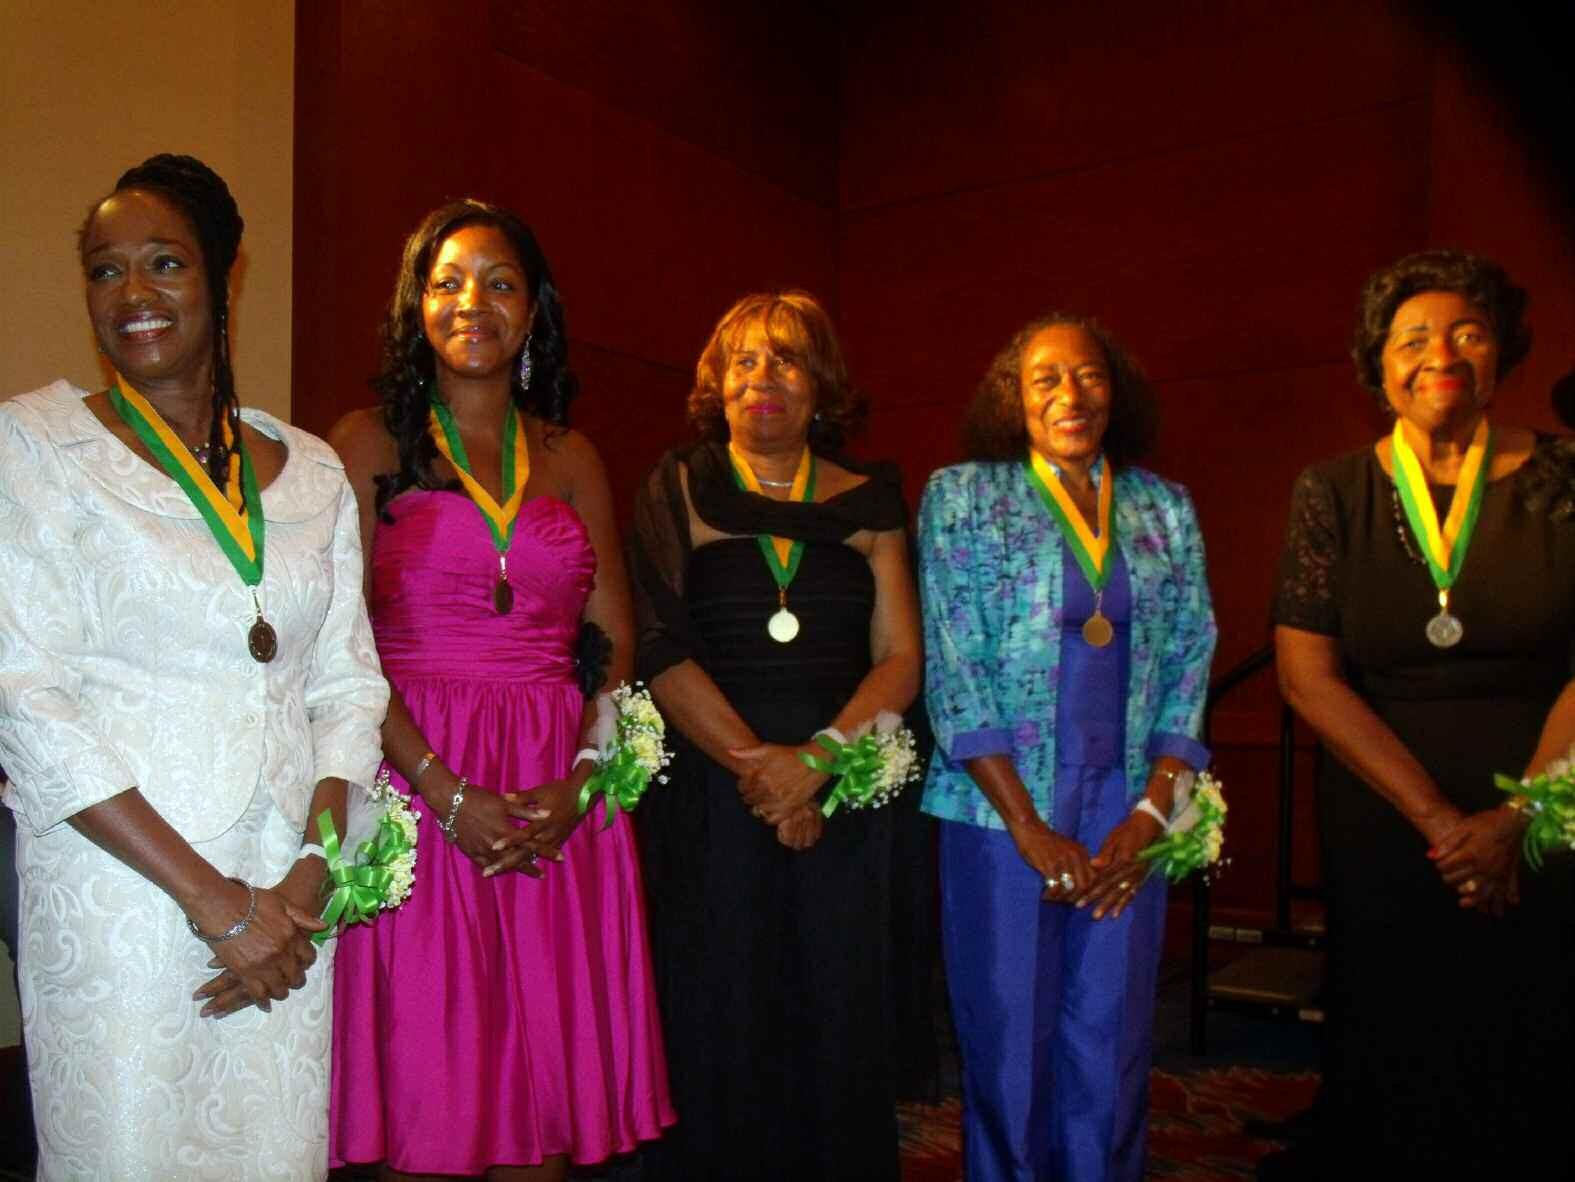 L-R Dr. Clarissa Myrick-Harris, Dr. Kenya Lenoir Messer, Dr. Lucille Hilliard, Dr. Brenda Vincent Cross, Dr. Althea Masterson and Dr. Charlotte Lee (not pictured)